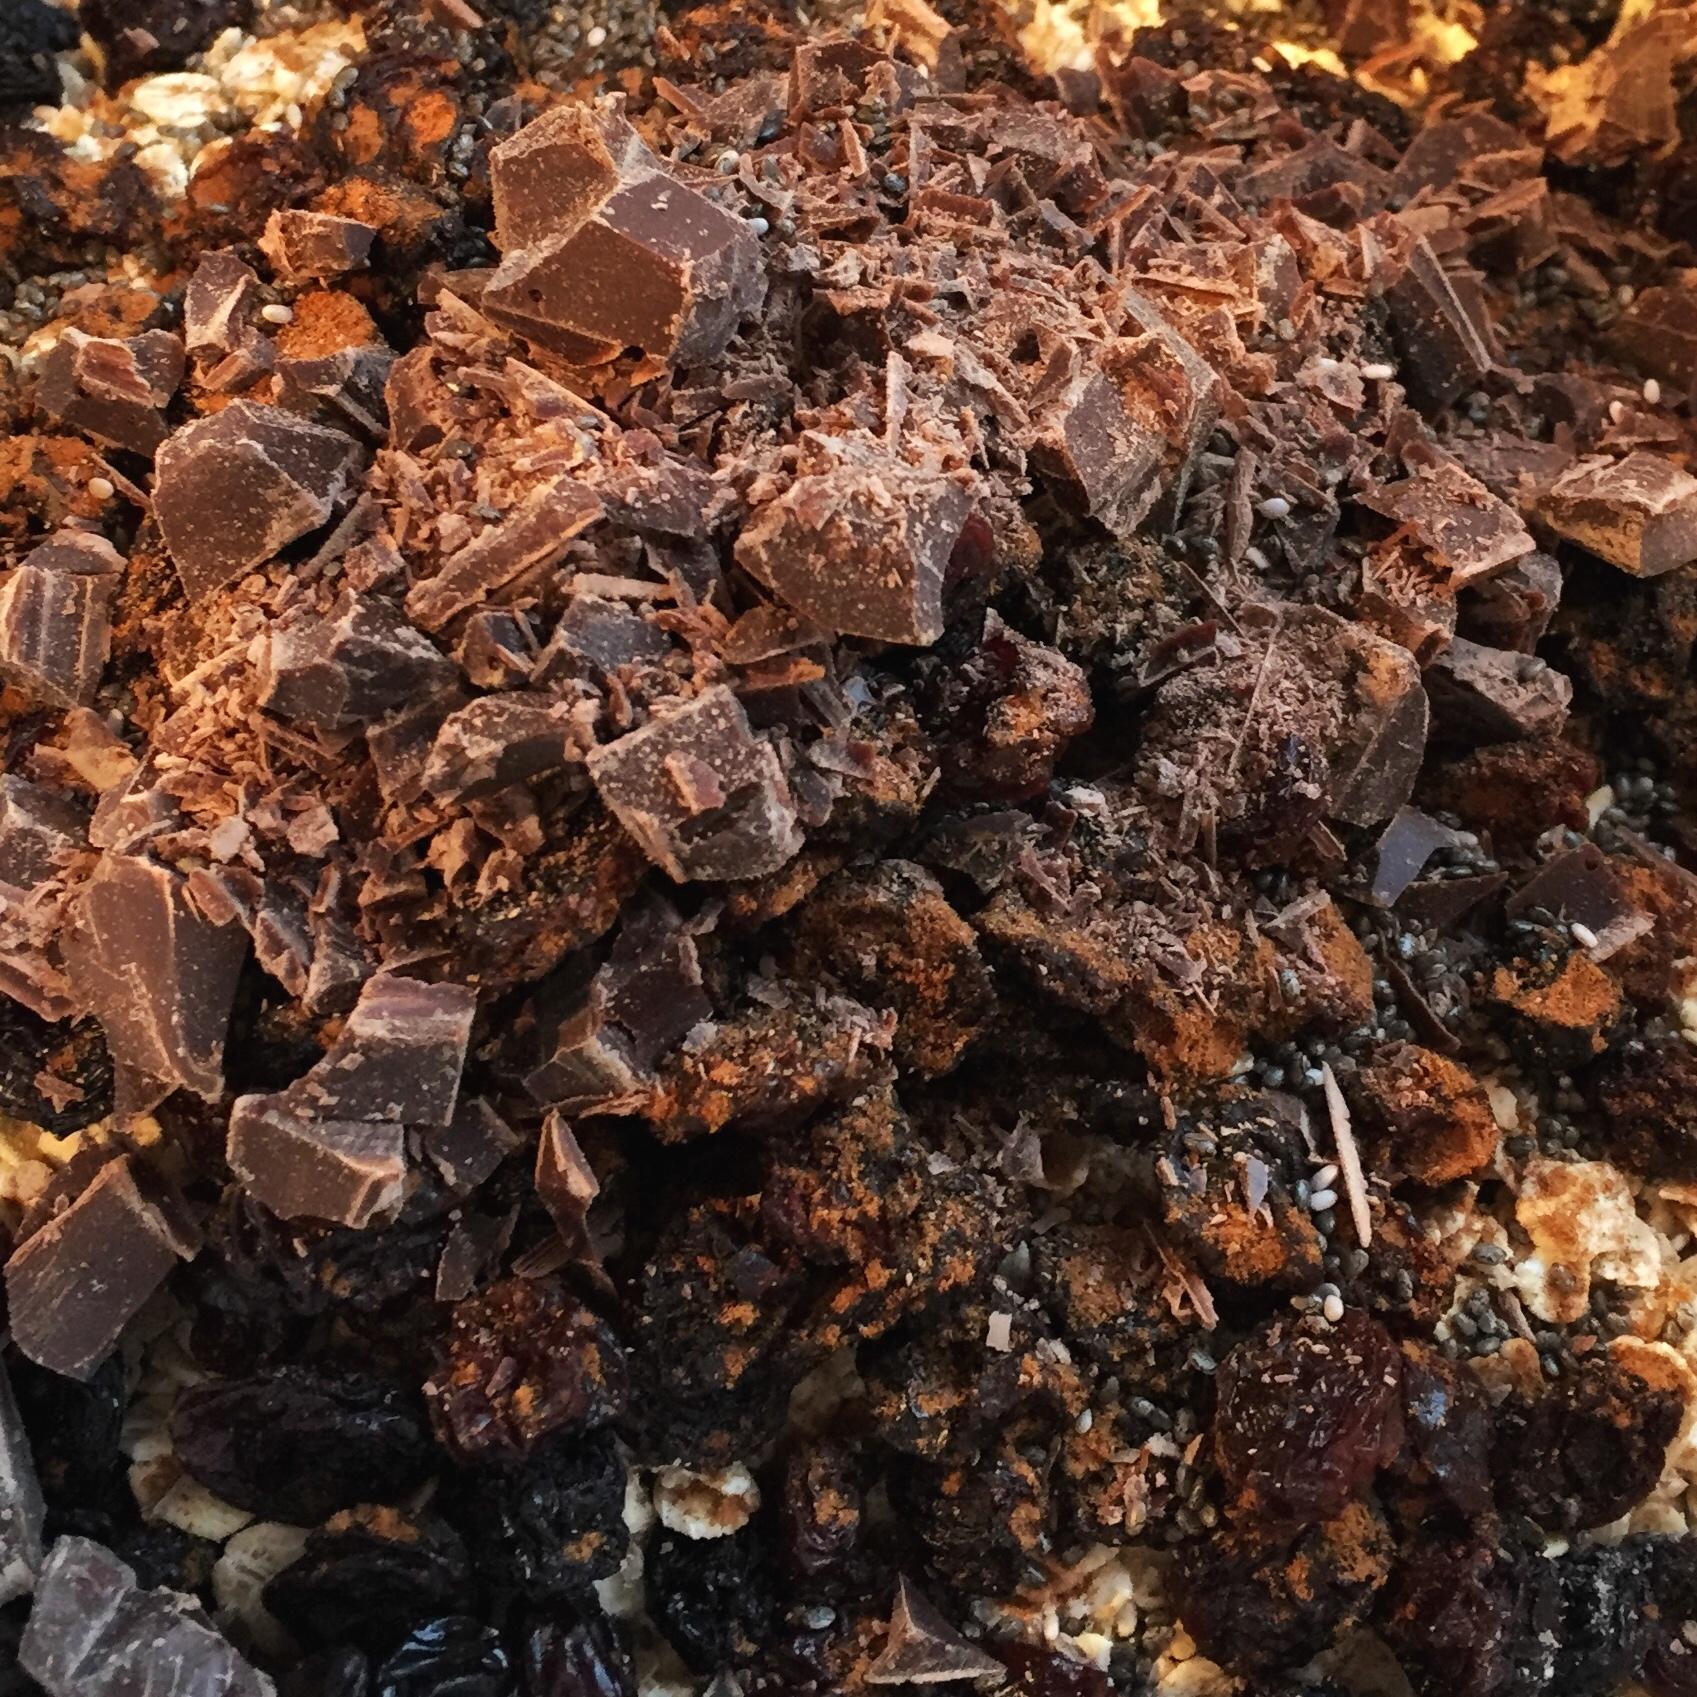 Throw in whatever you like! We added dark chocolate, chia seeds, raisins, cinnamon and honey...